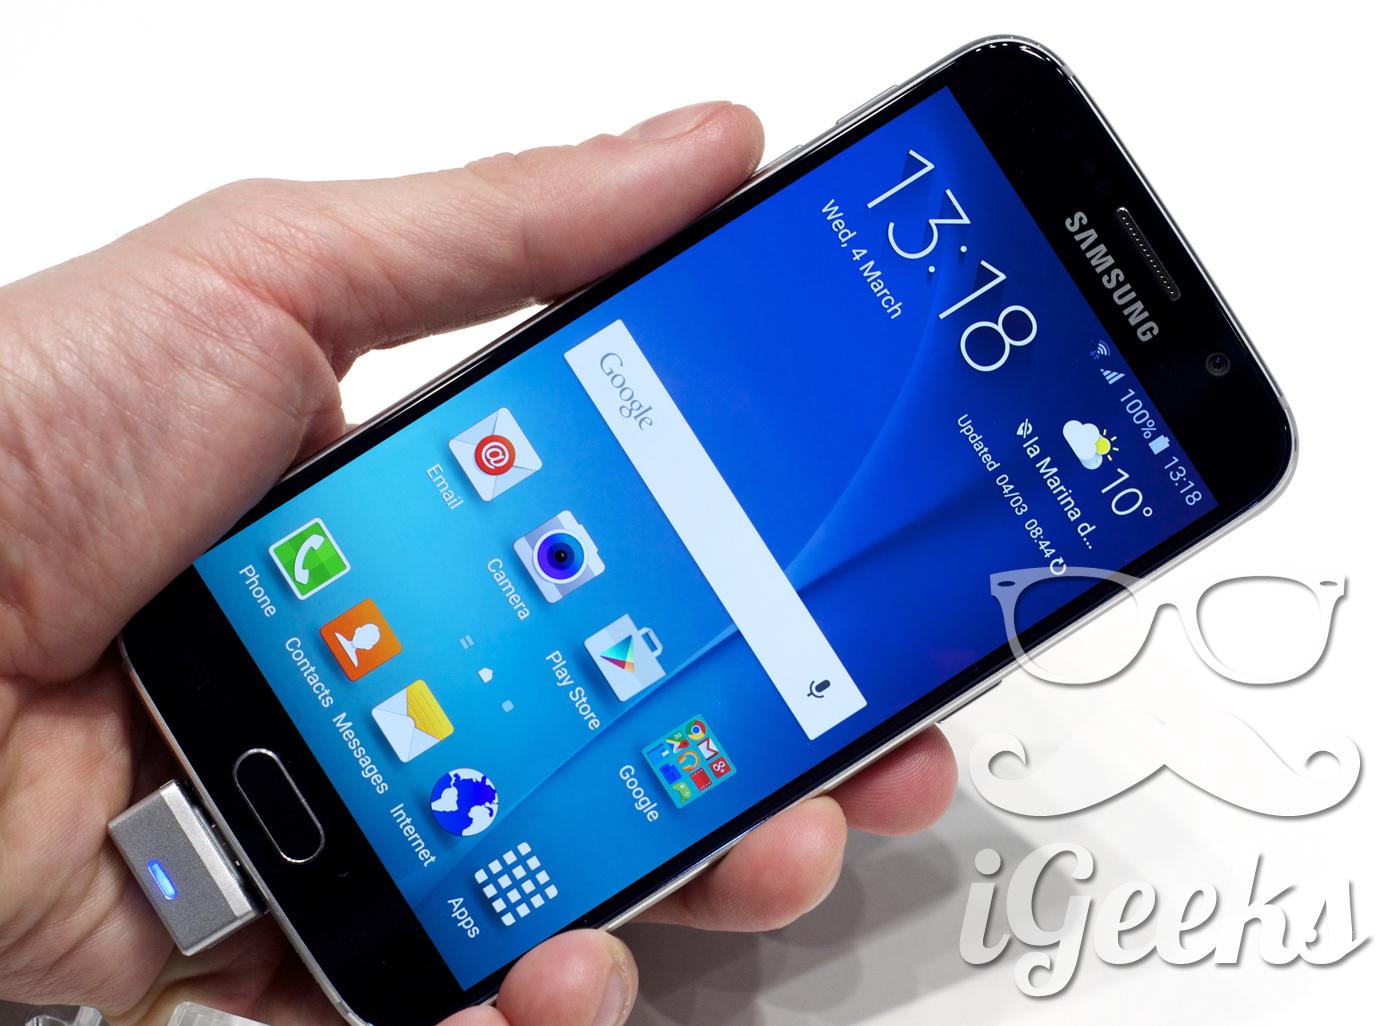 iGeeks-Samsung-S6-MWC2015-08